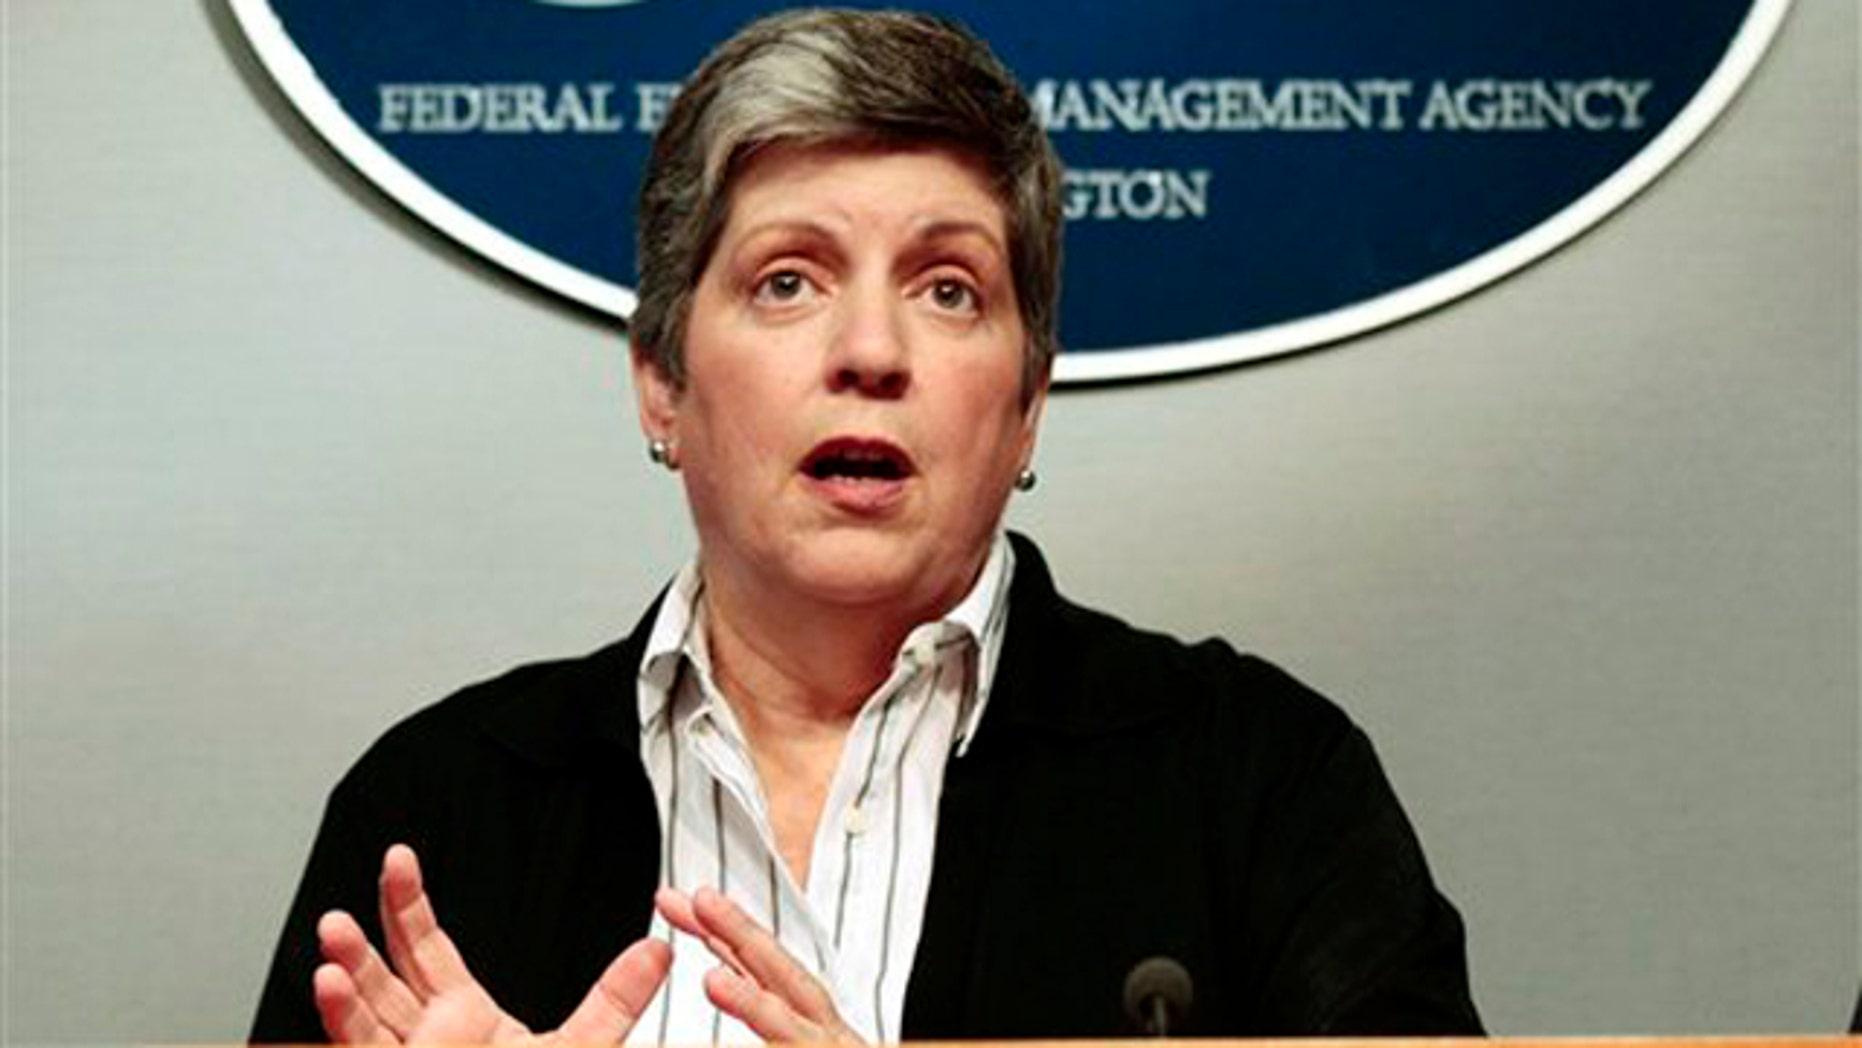 Homeland Security Secretary Janet Napolitano speaks at FEMA headquarters in Washington Aug. 28.